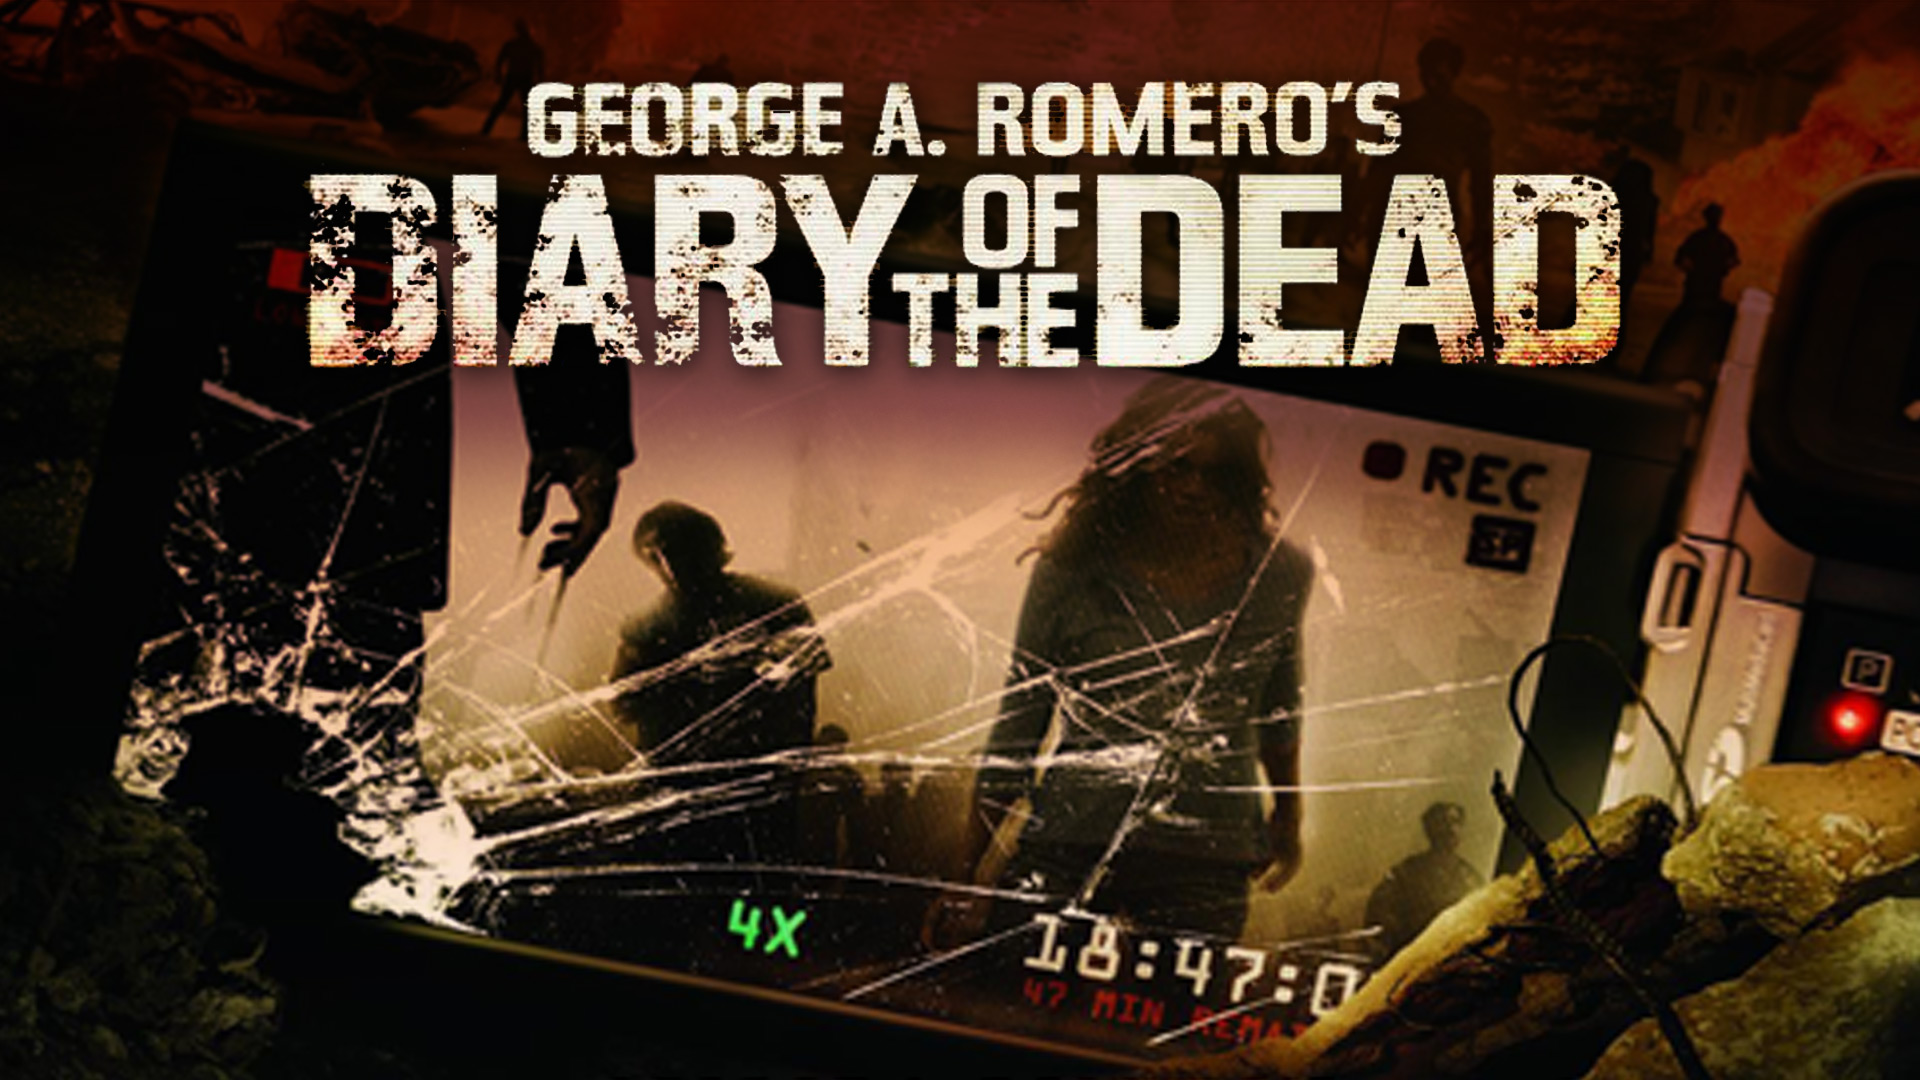 George Romero's Diary of the Dead